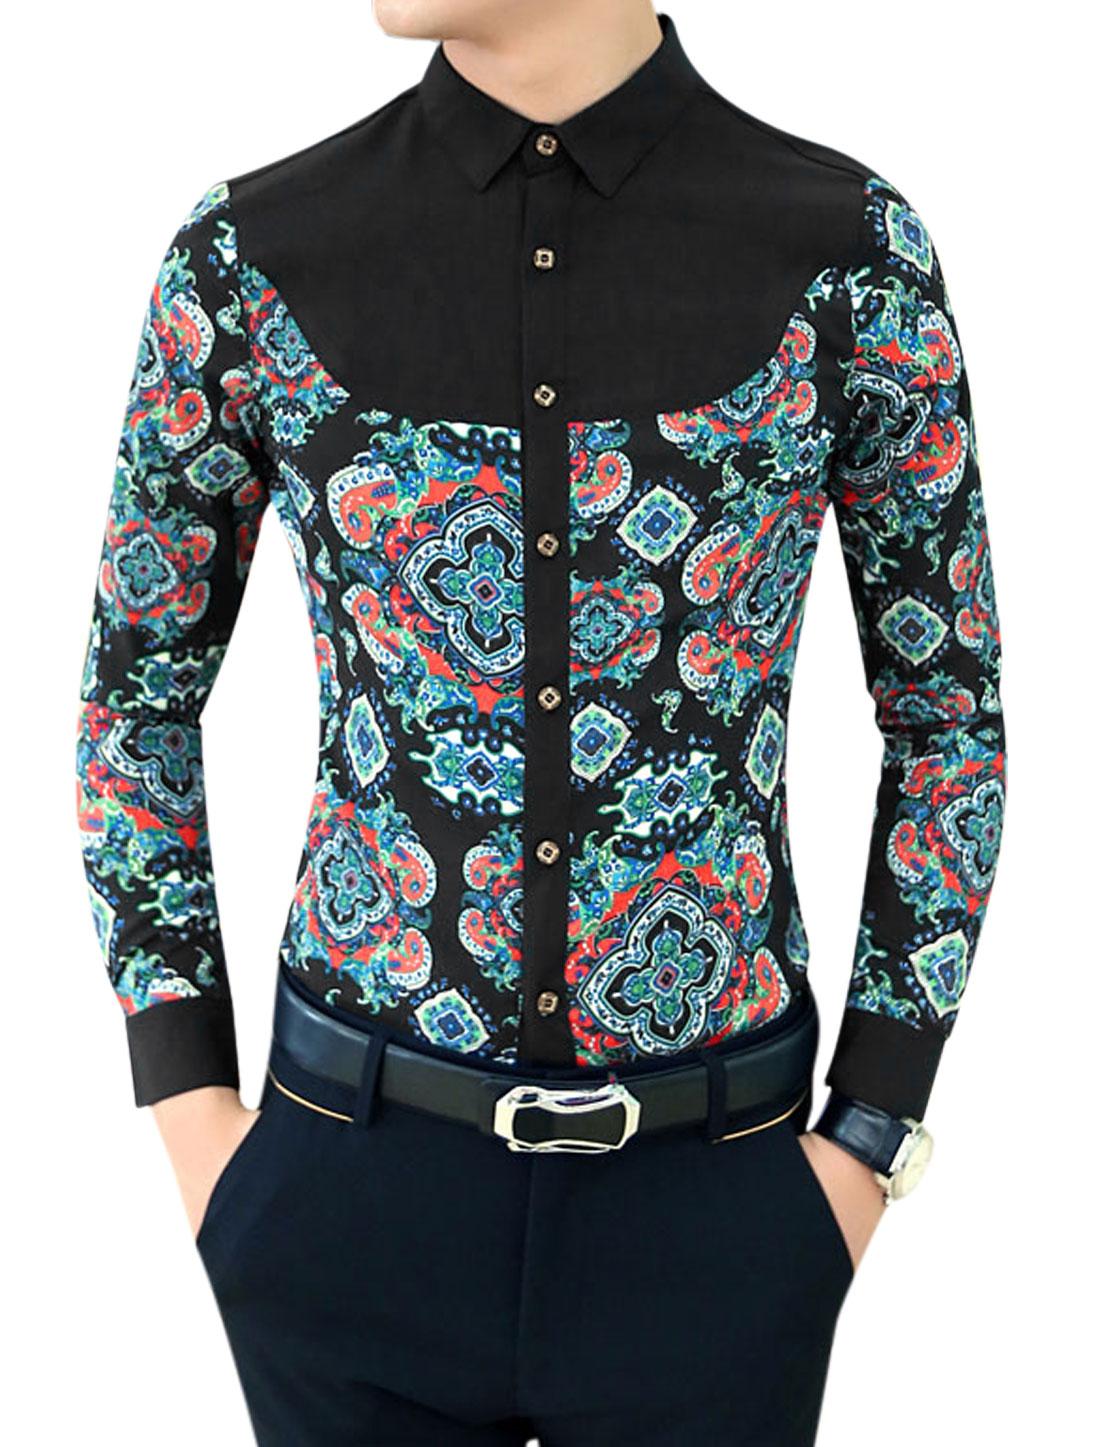 Men New Panel Contrast Shoulder Contrast Jacquard Print Shirt Black Orange M